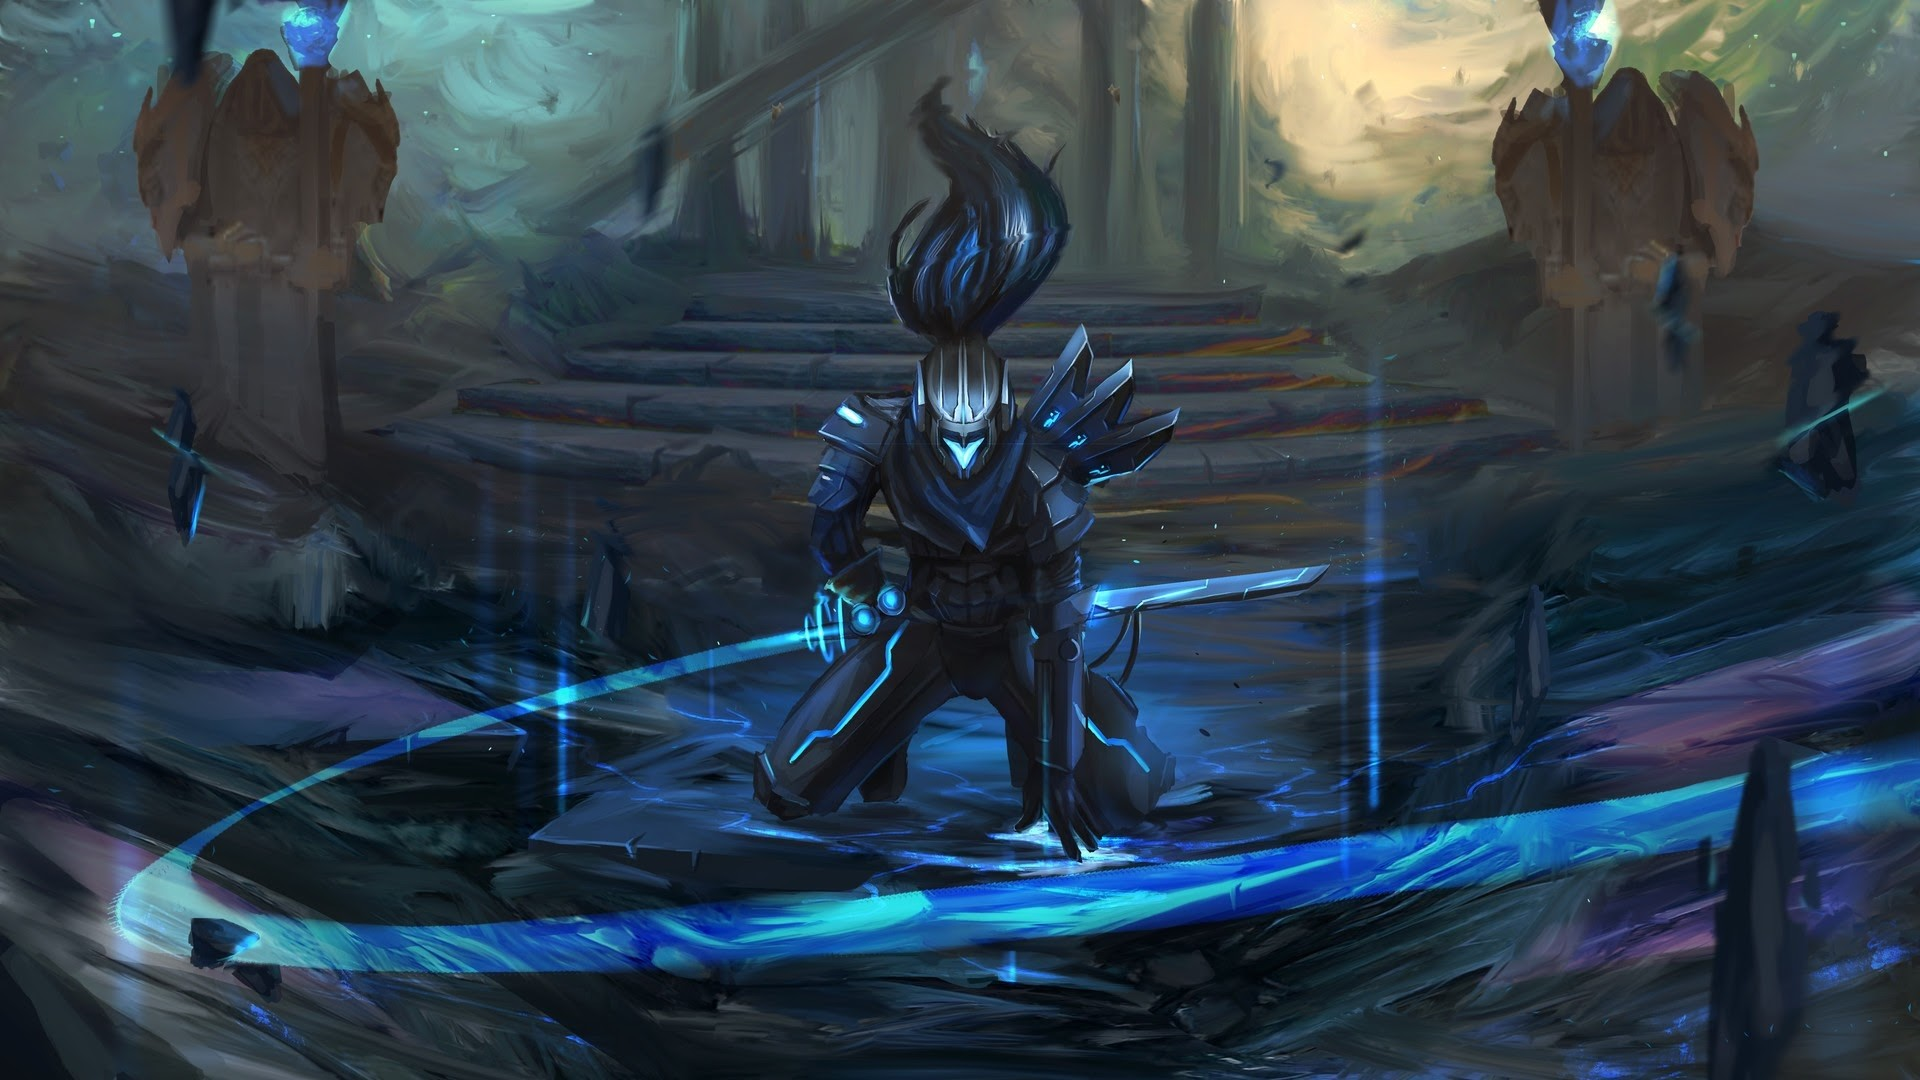 Project Yasuo League of Legends Wallpaper #34431